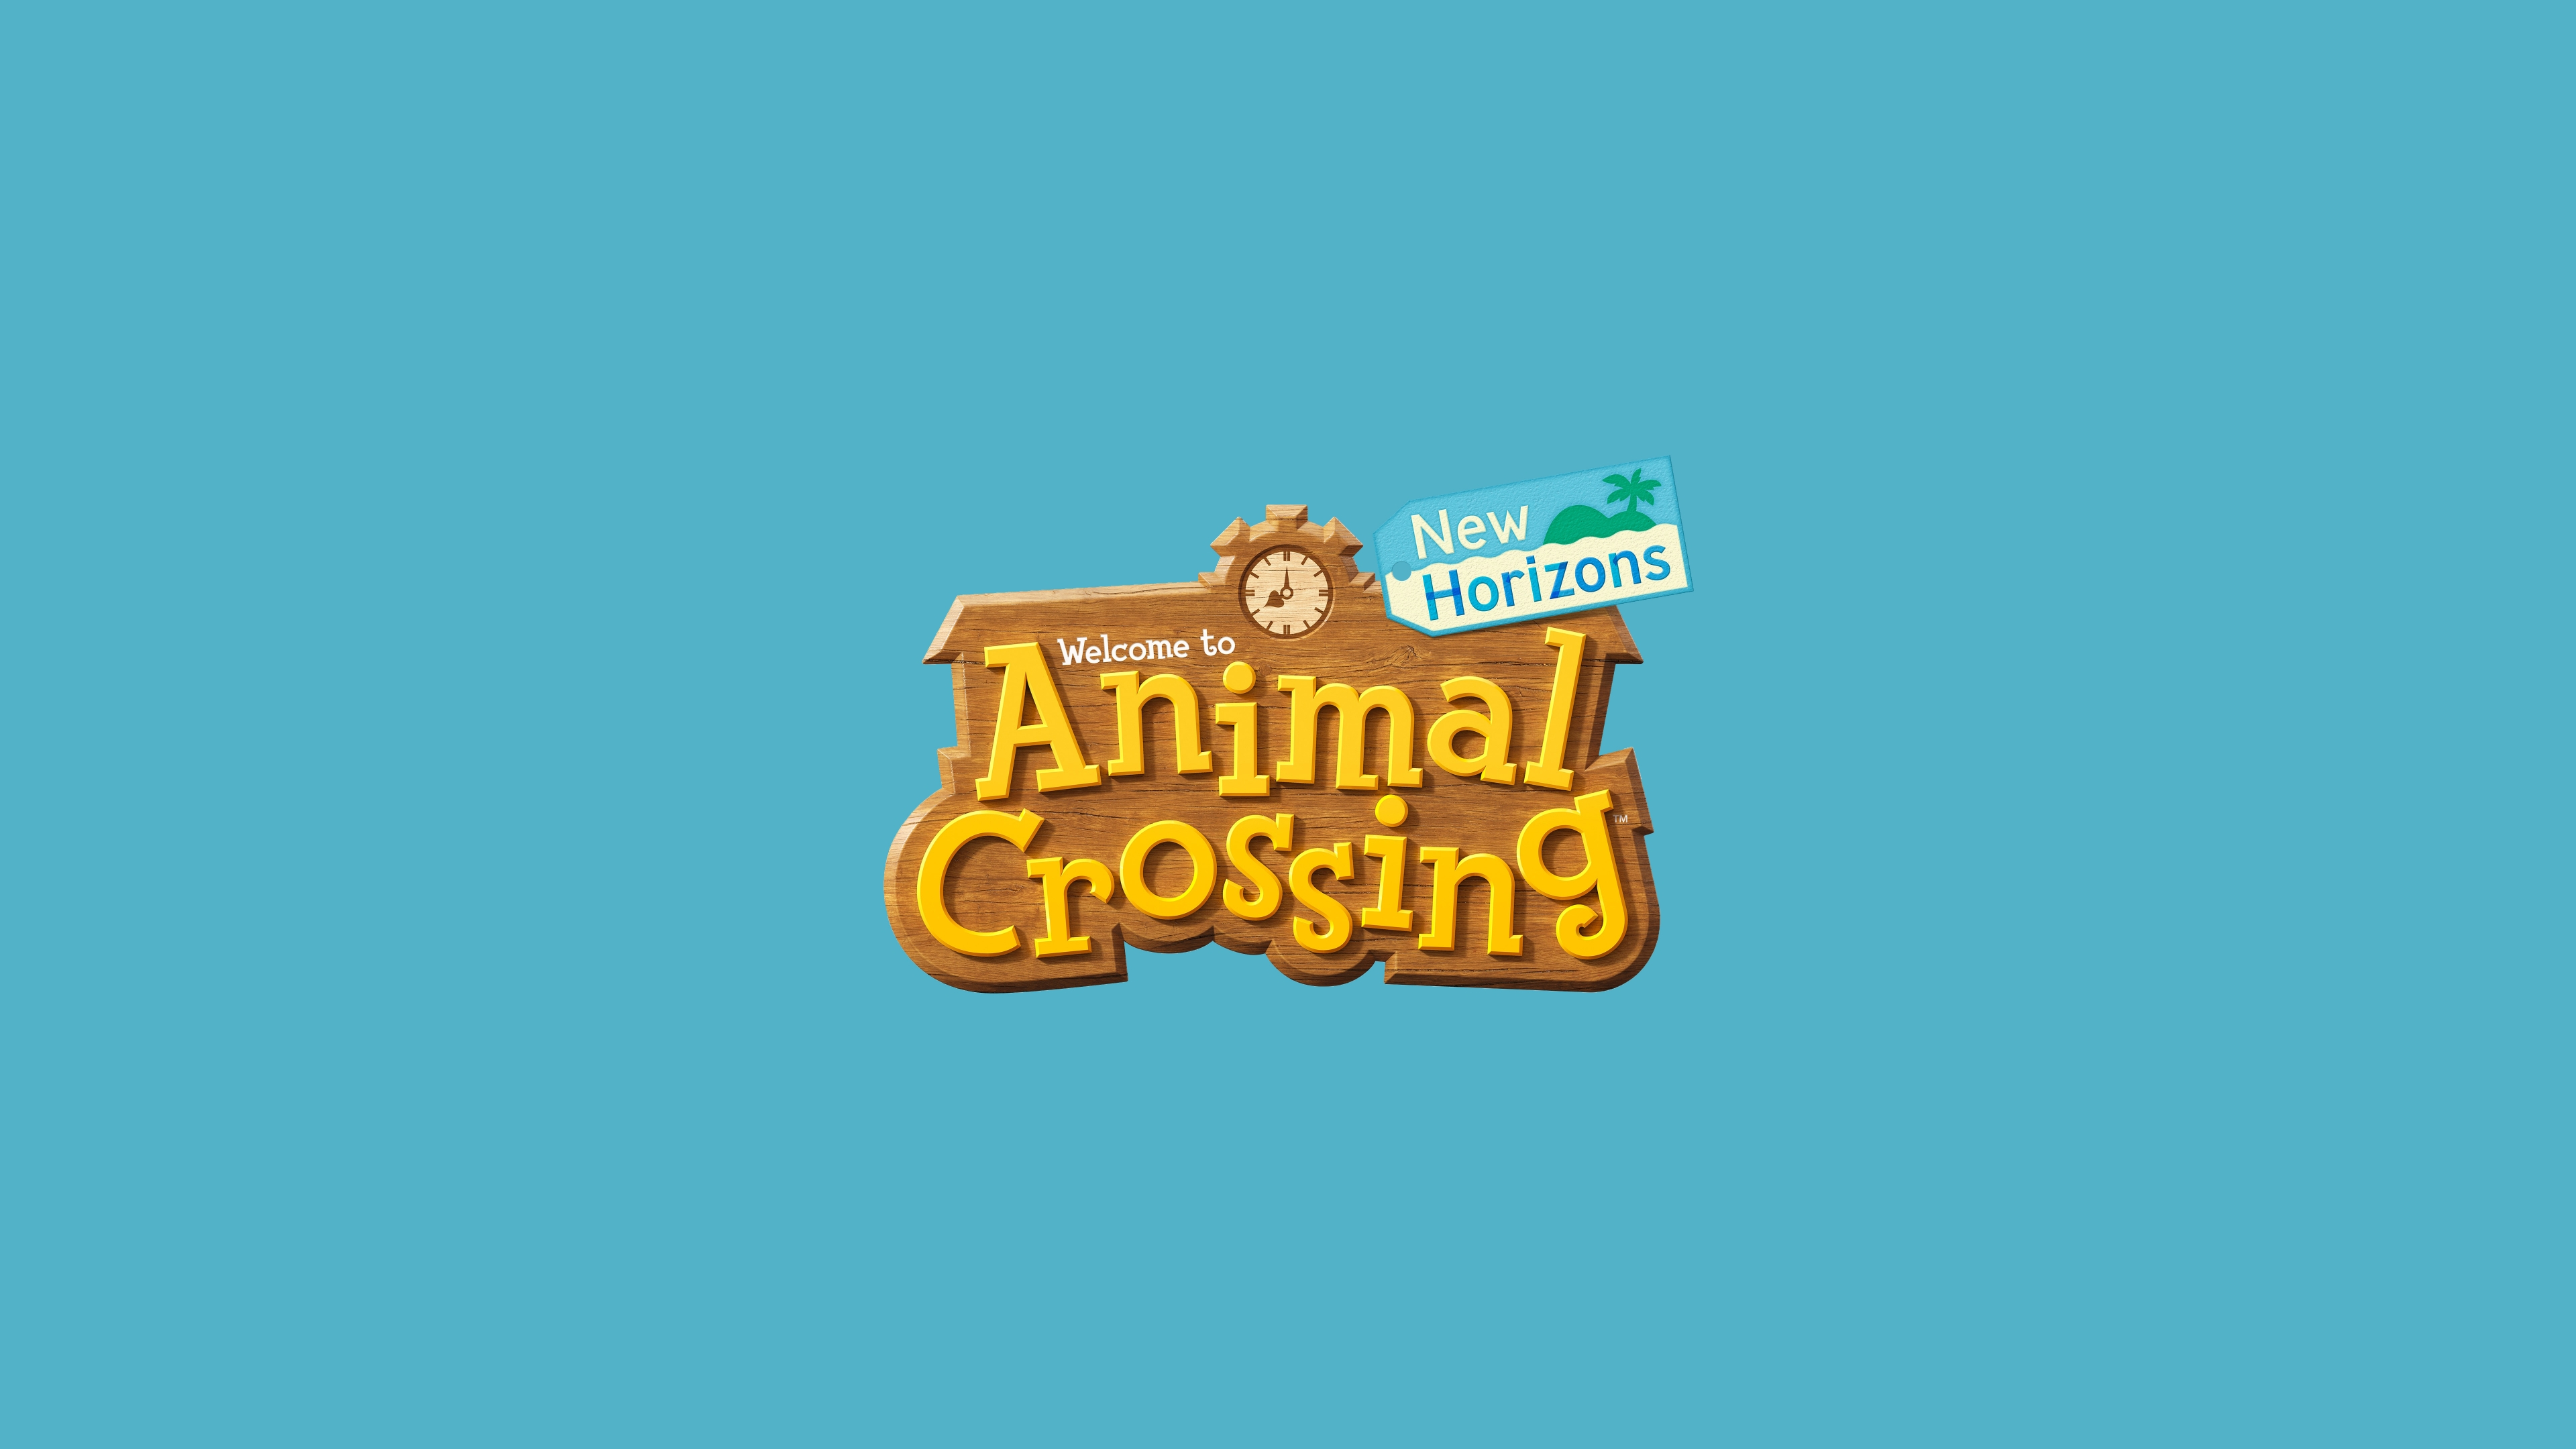 animal crossing new horizons wallpaper 1920x1080